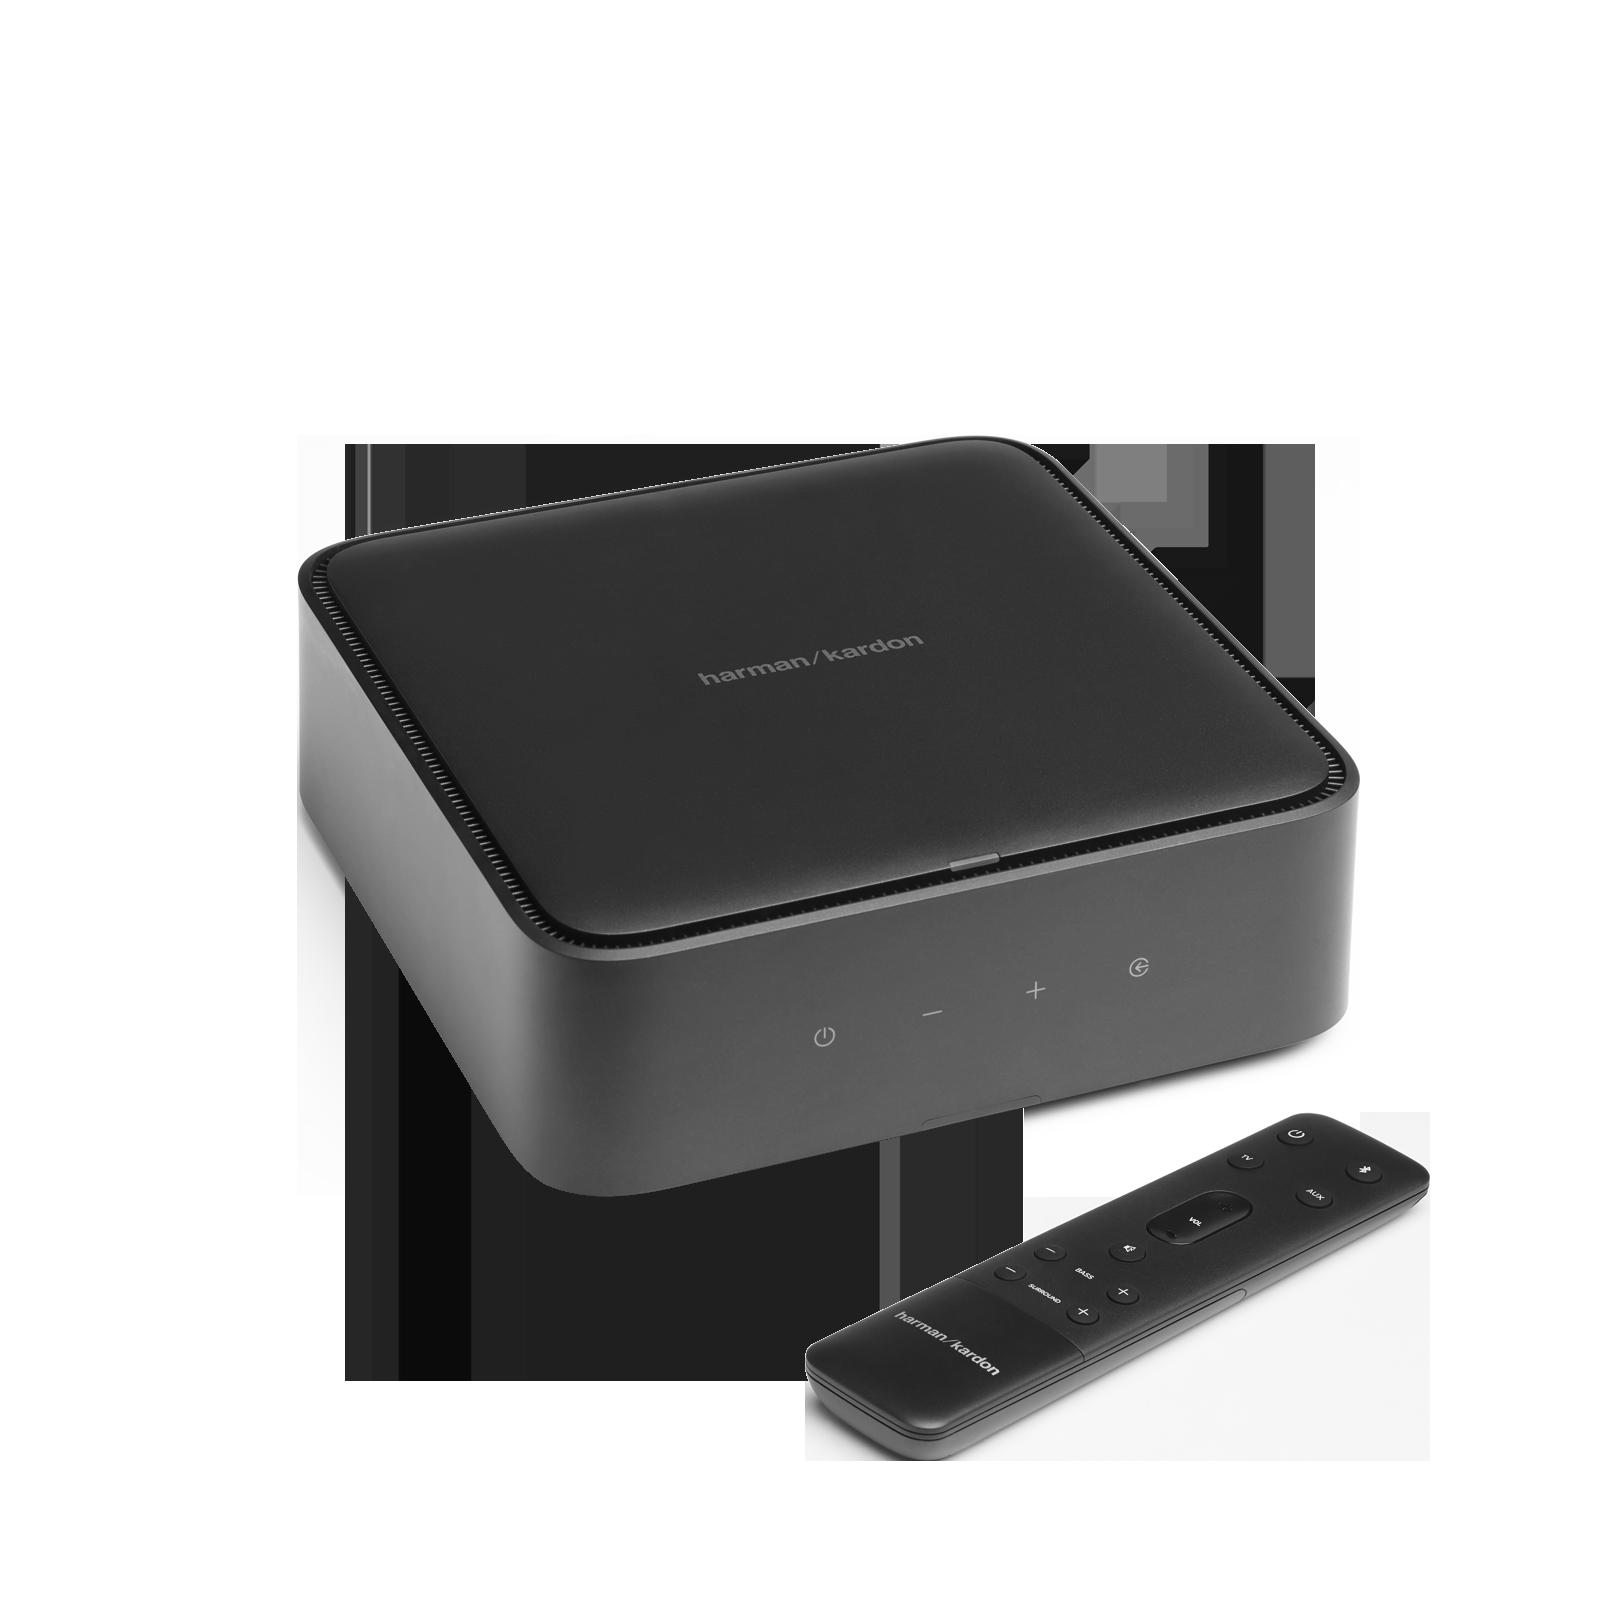 Harman Kardon Citation Amp - Black - High-power, wireless streaming stereo amplifier - Hero